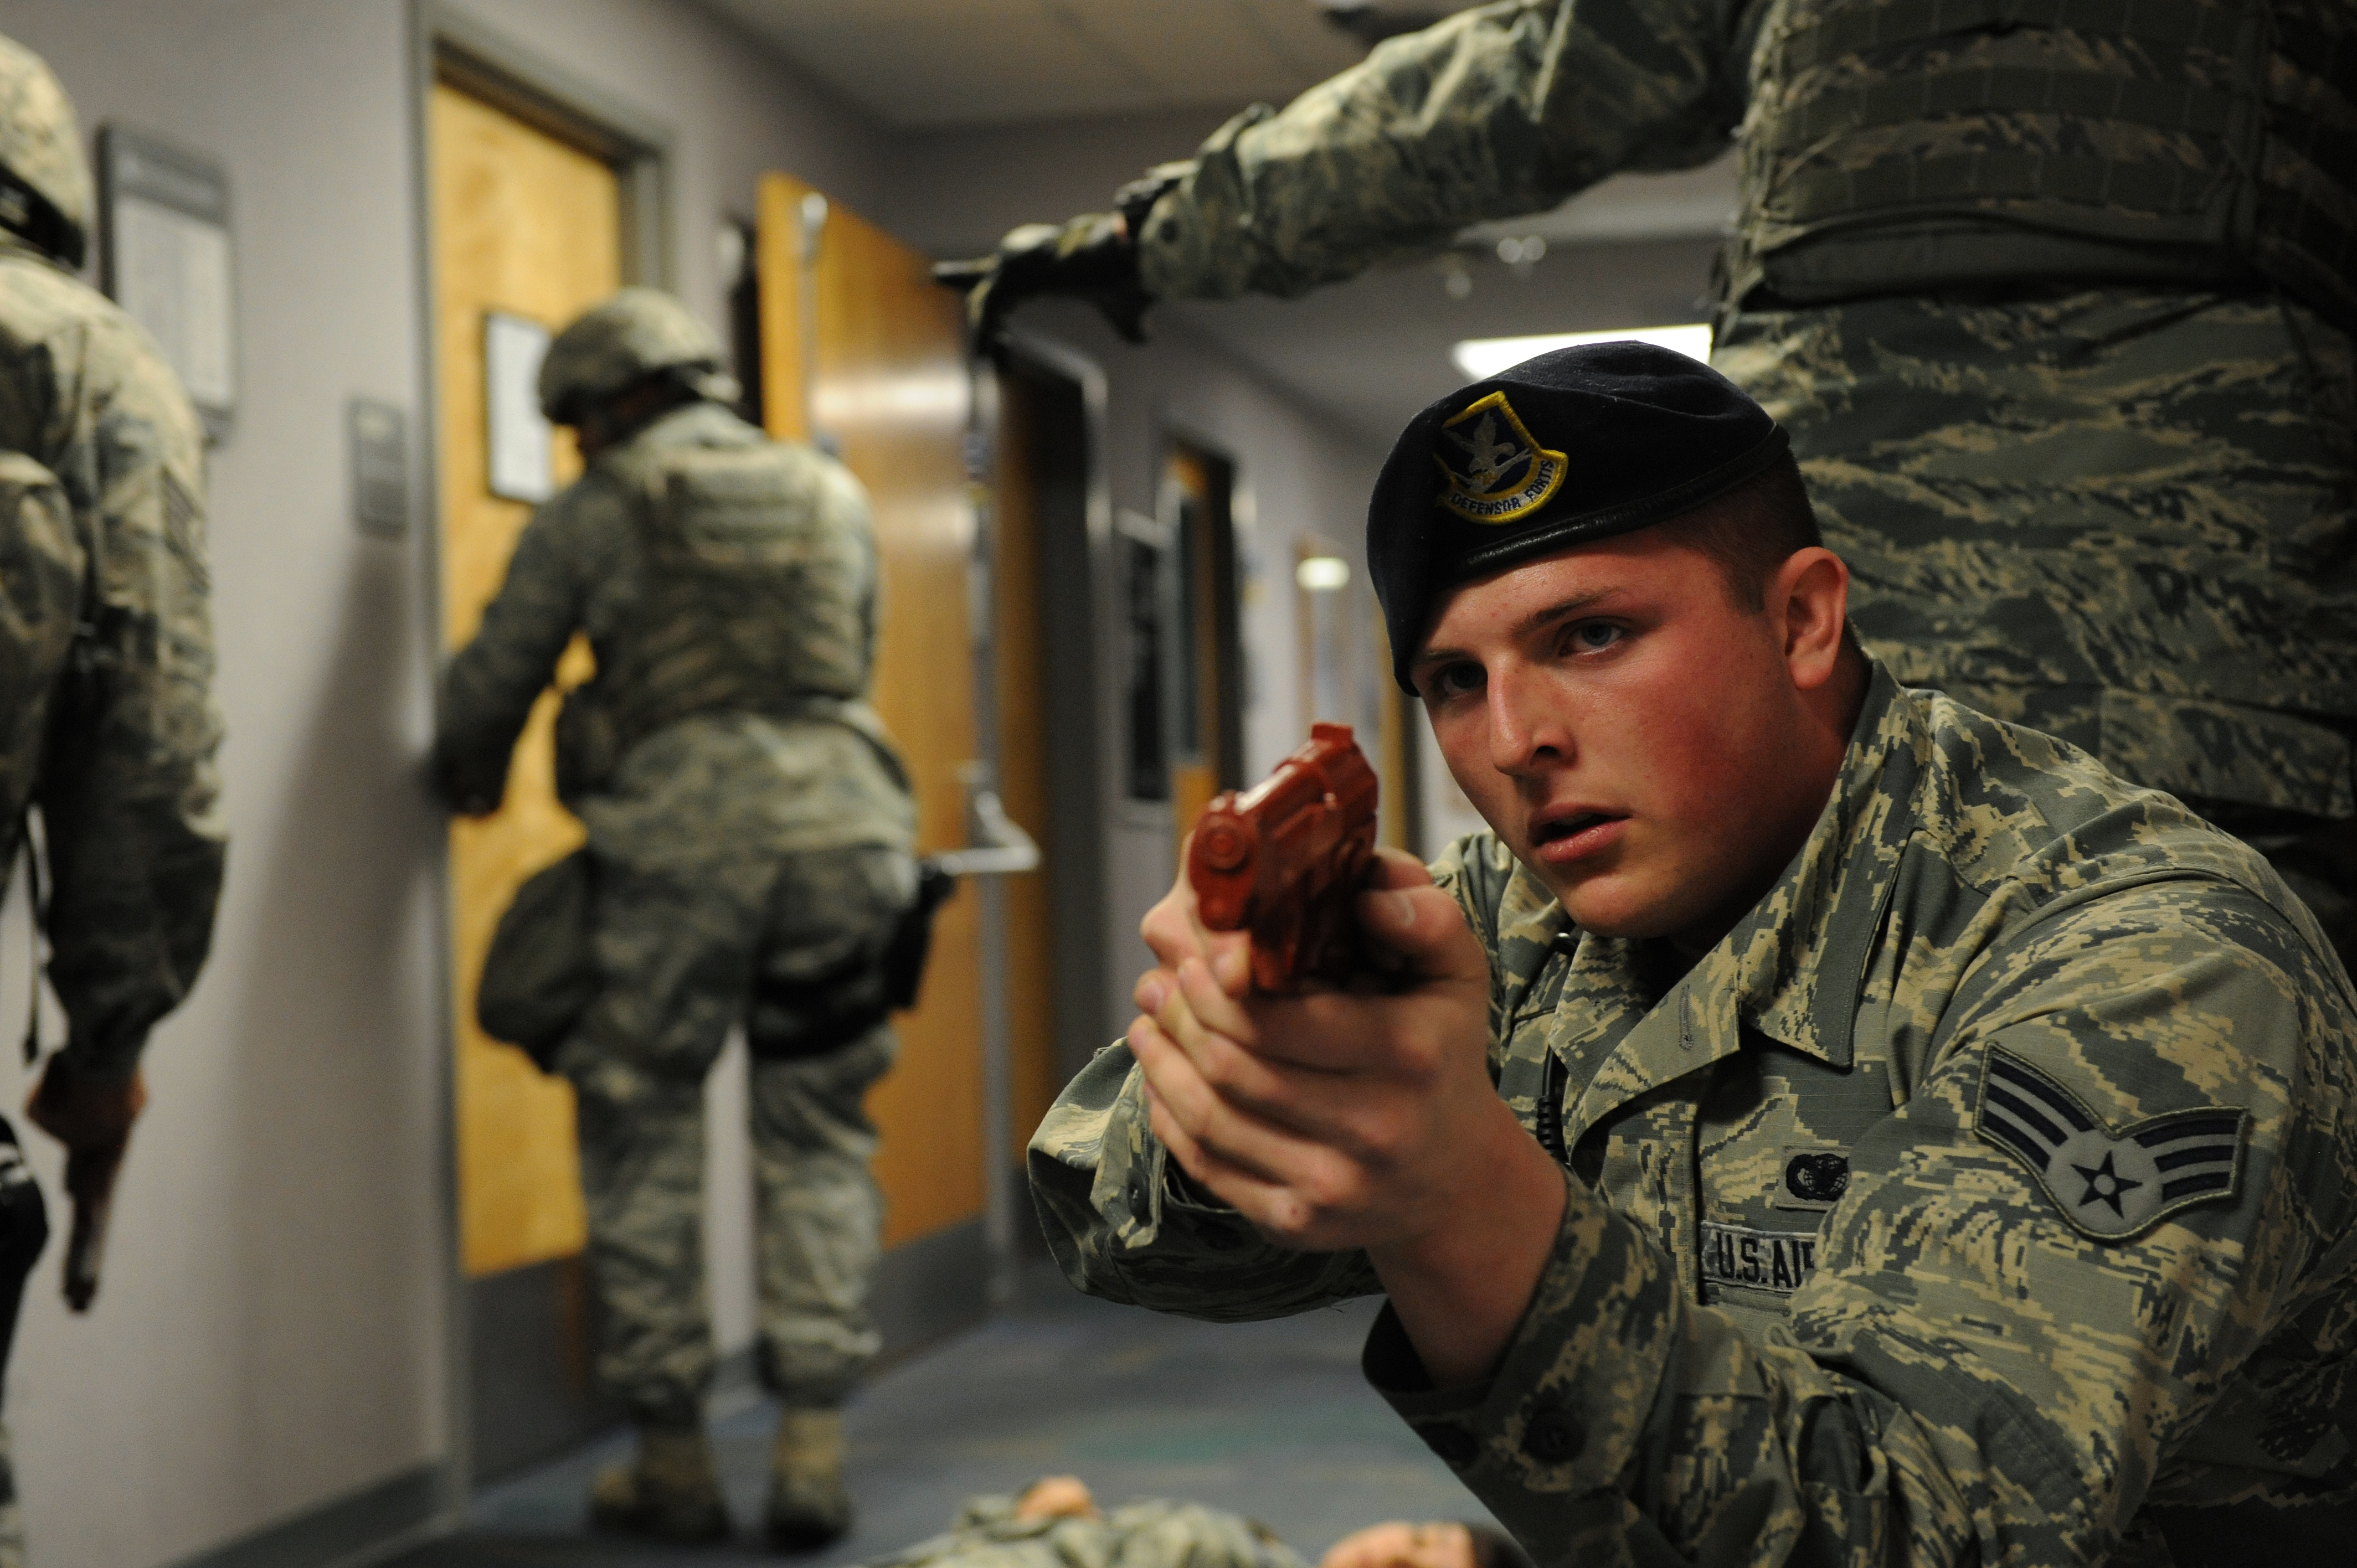 team whiteman participates in active shooter exercise > air force team whiteman participates in active shooter exercise